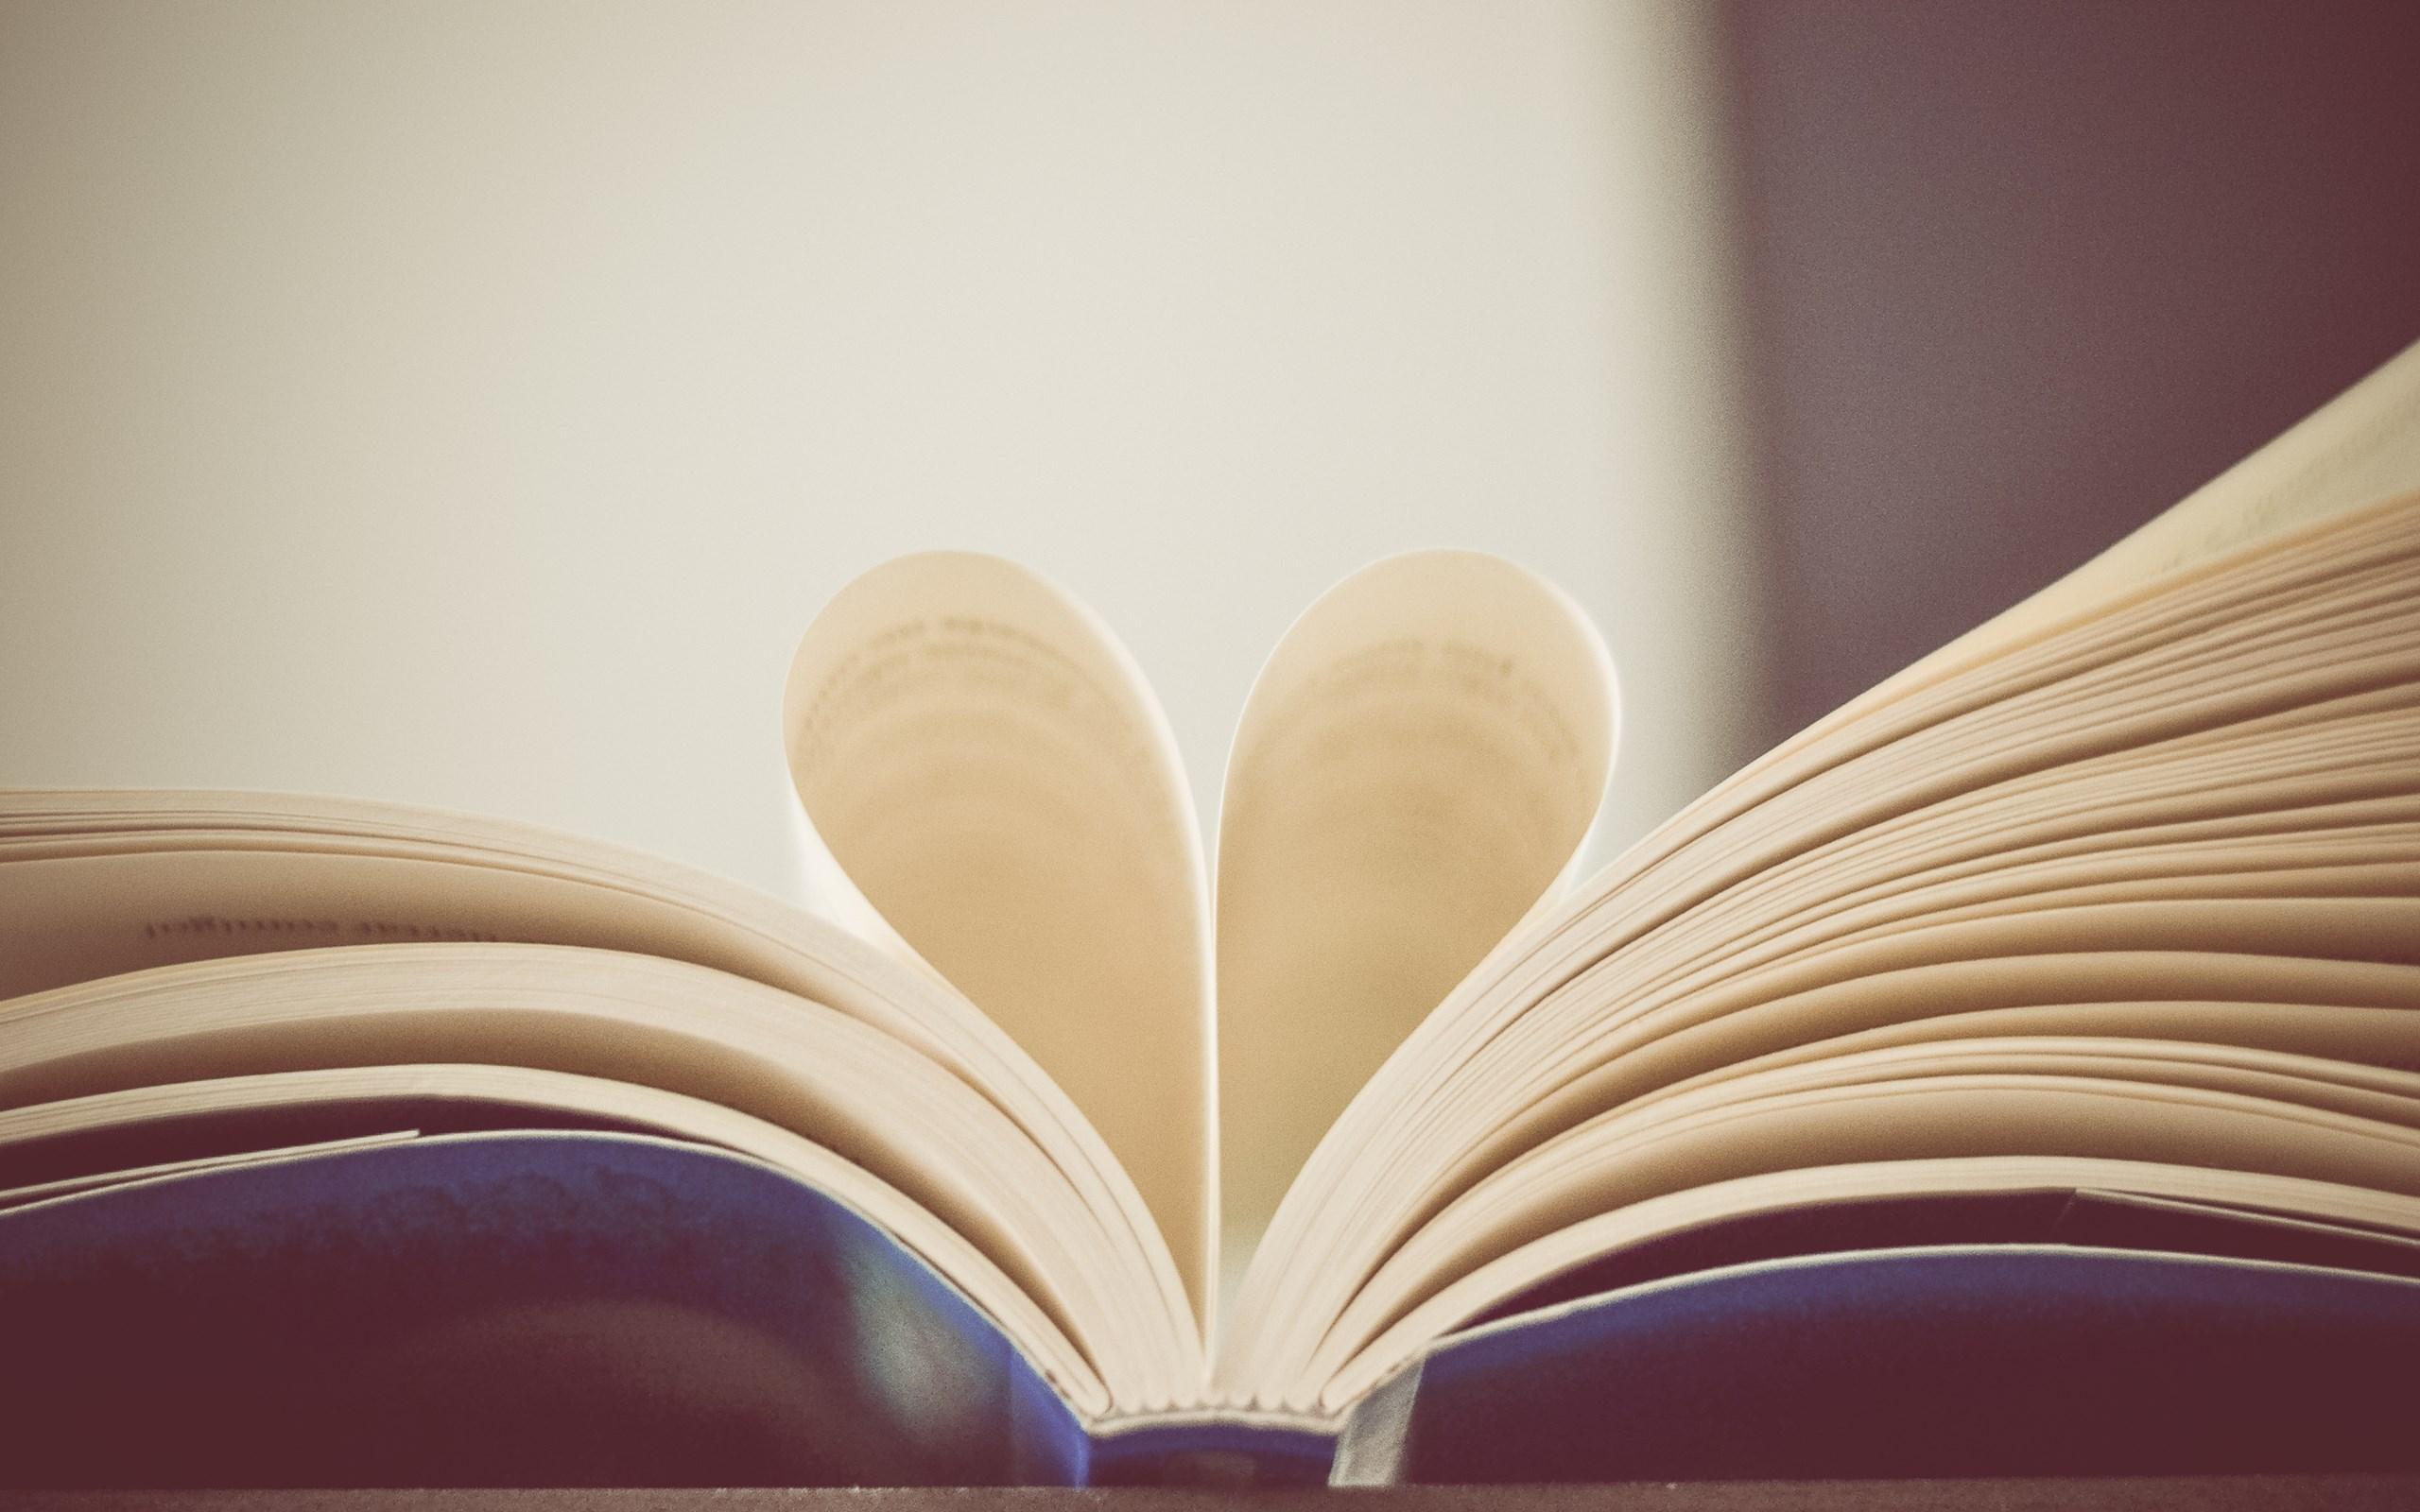 Ljubav je iskon dobrote: Osvrt na roman Altruista (anomalije srca)